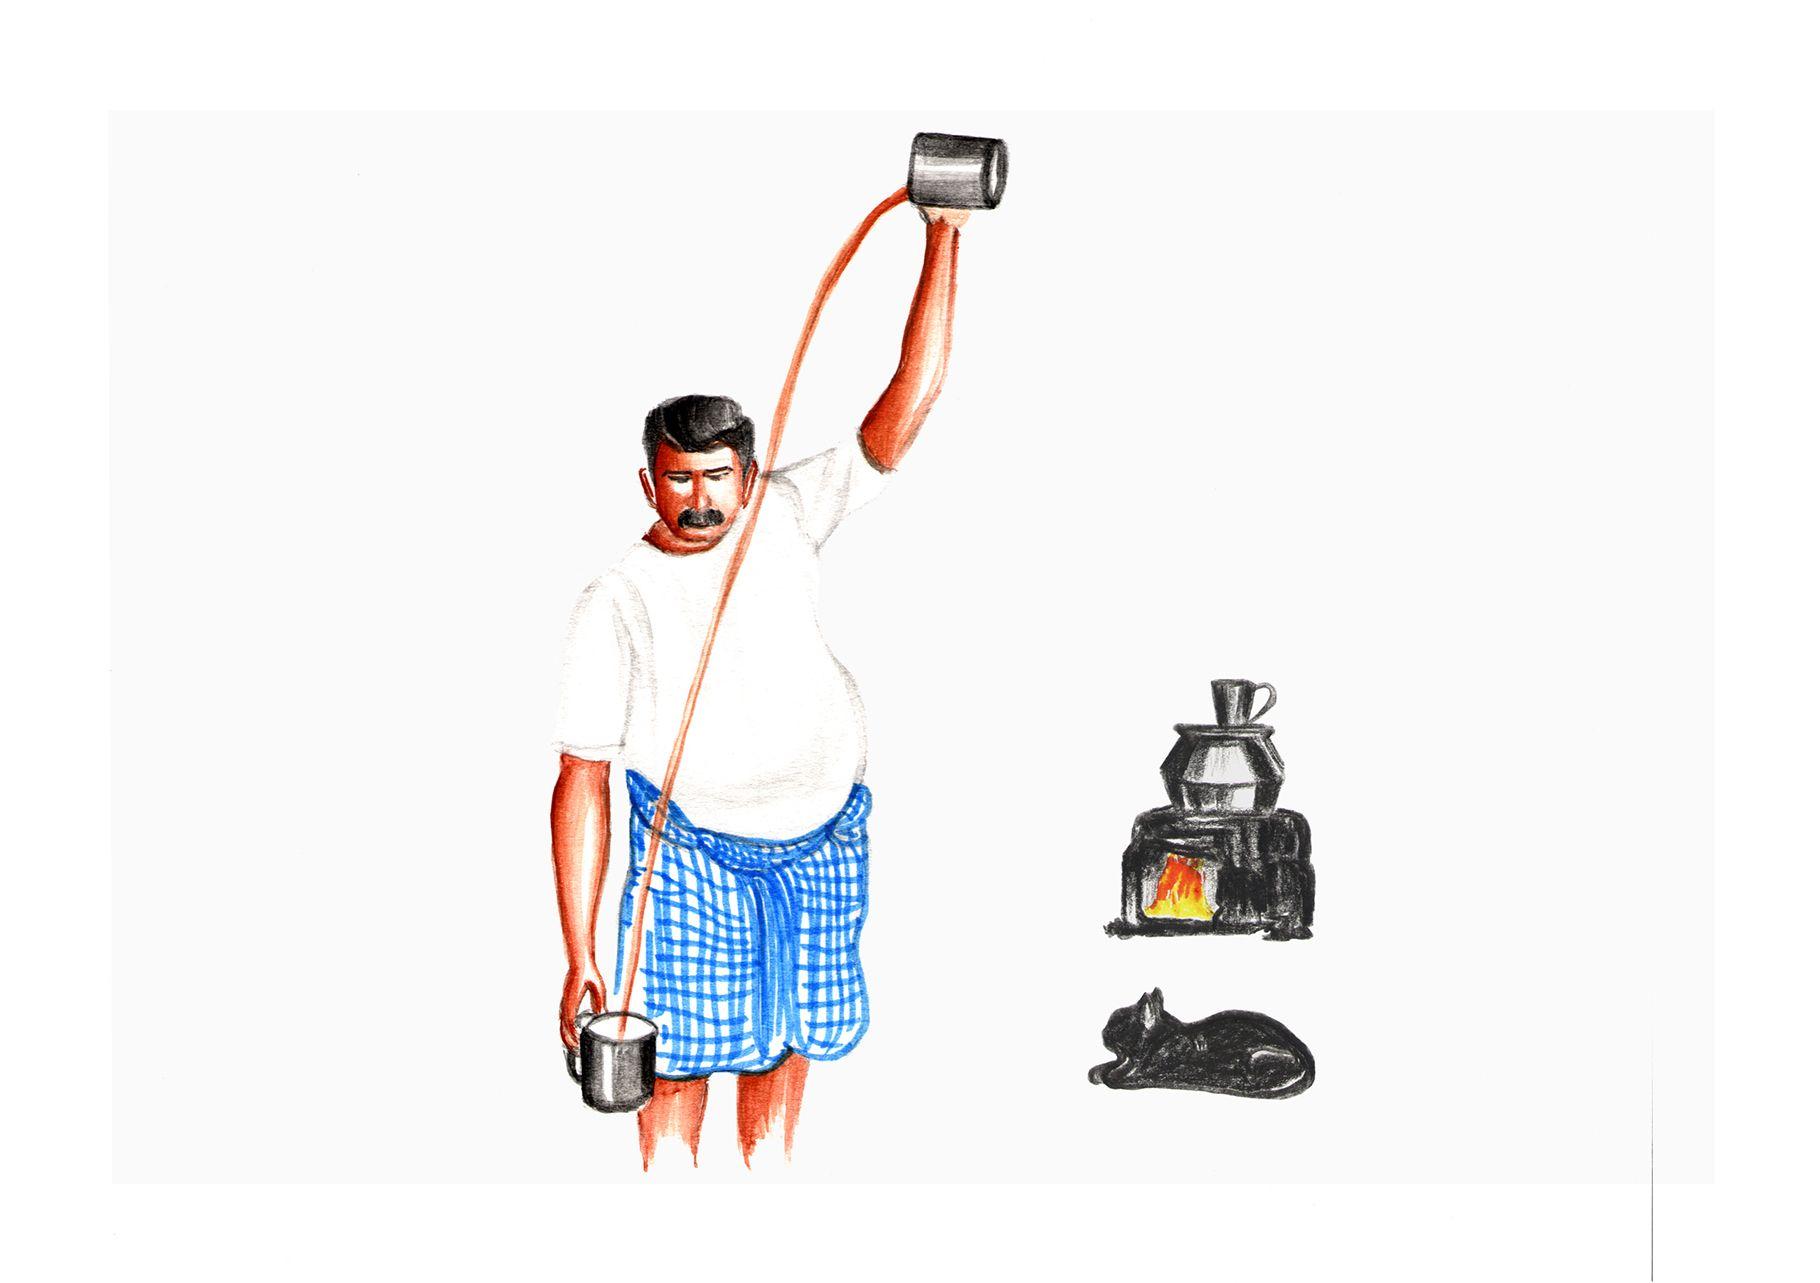 Art of Tea making | Chayakada, Illustrations of Kerala in